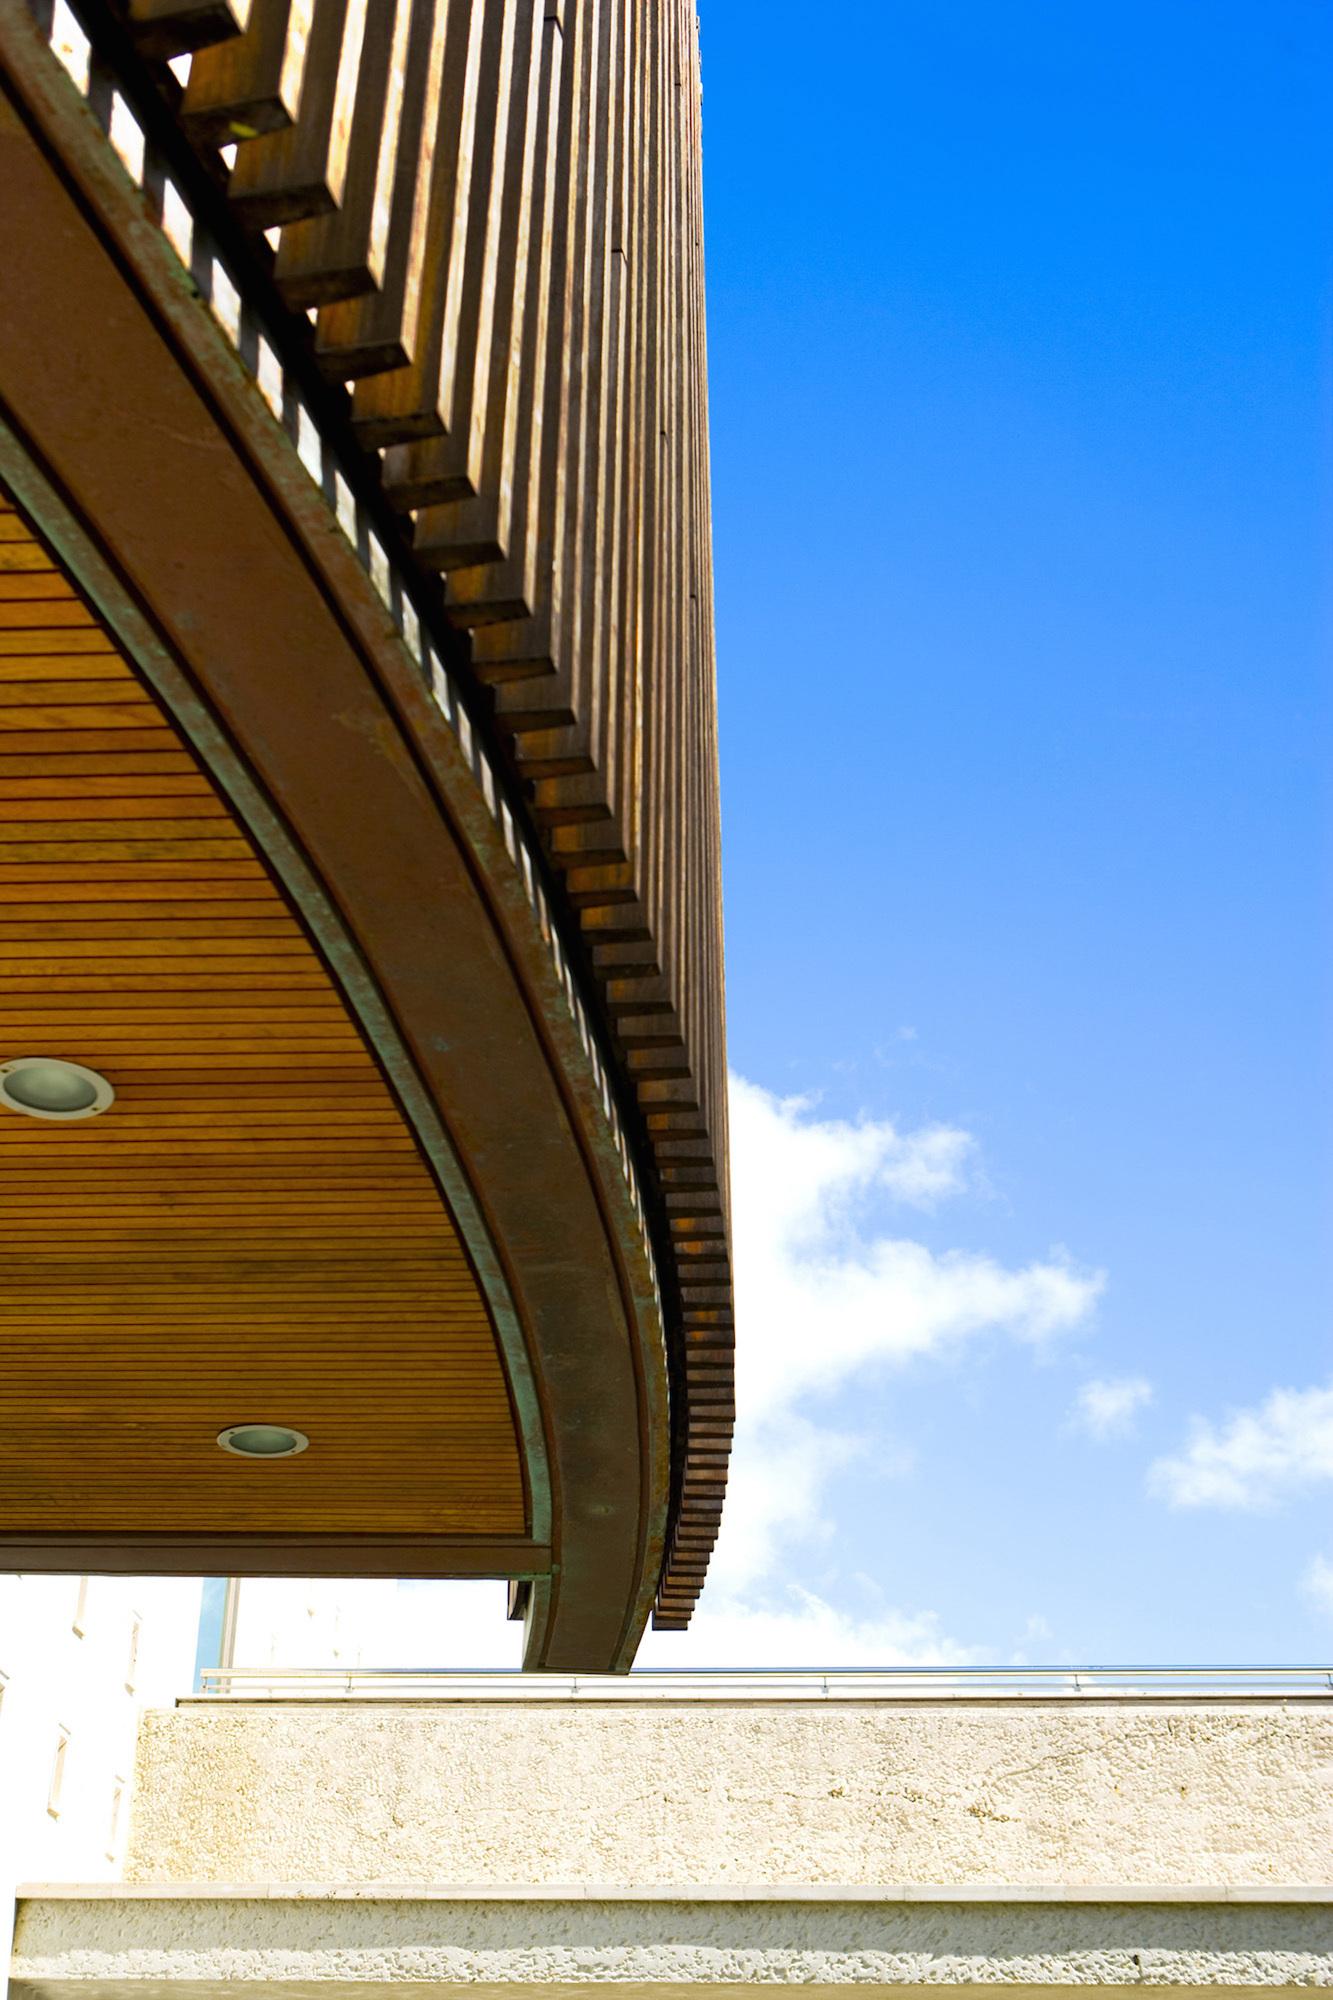 residencia-tavernier-drive-luis-pons-design-lab_chayane_house_032607_018